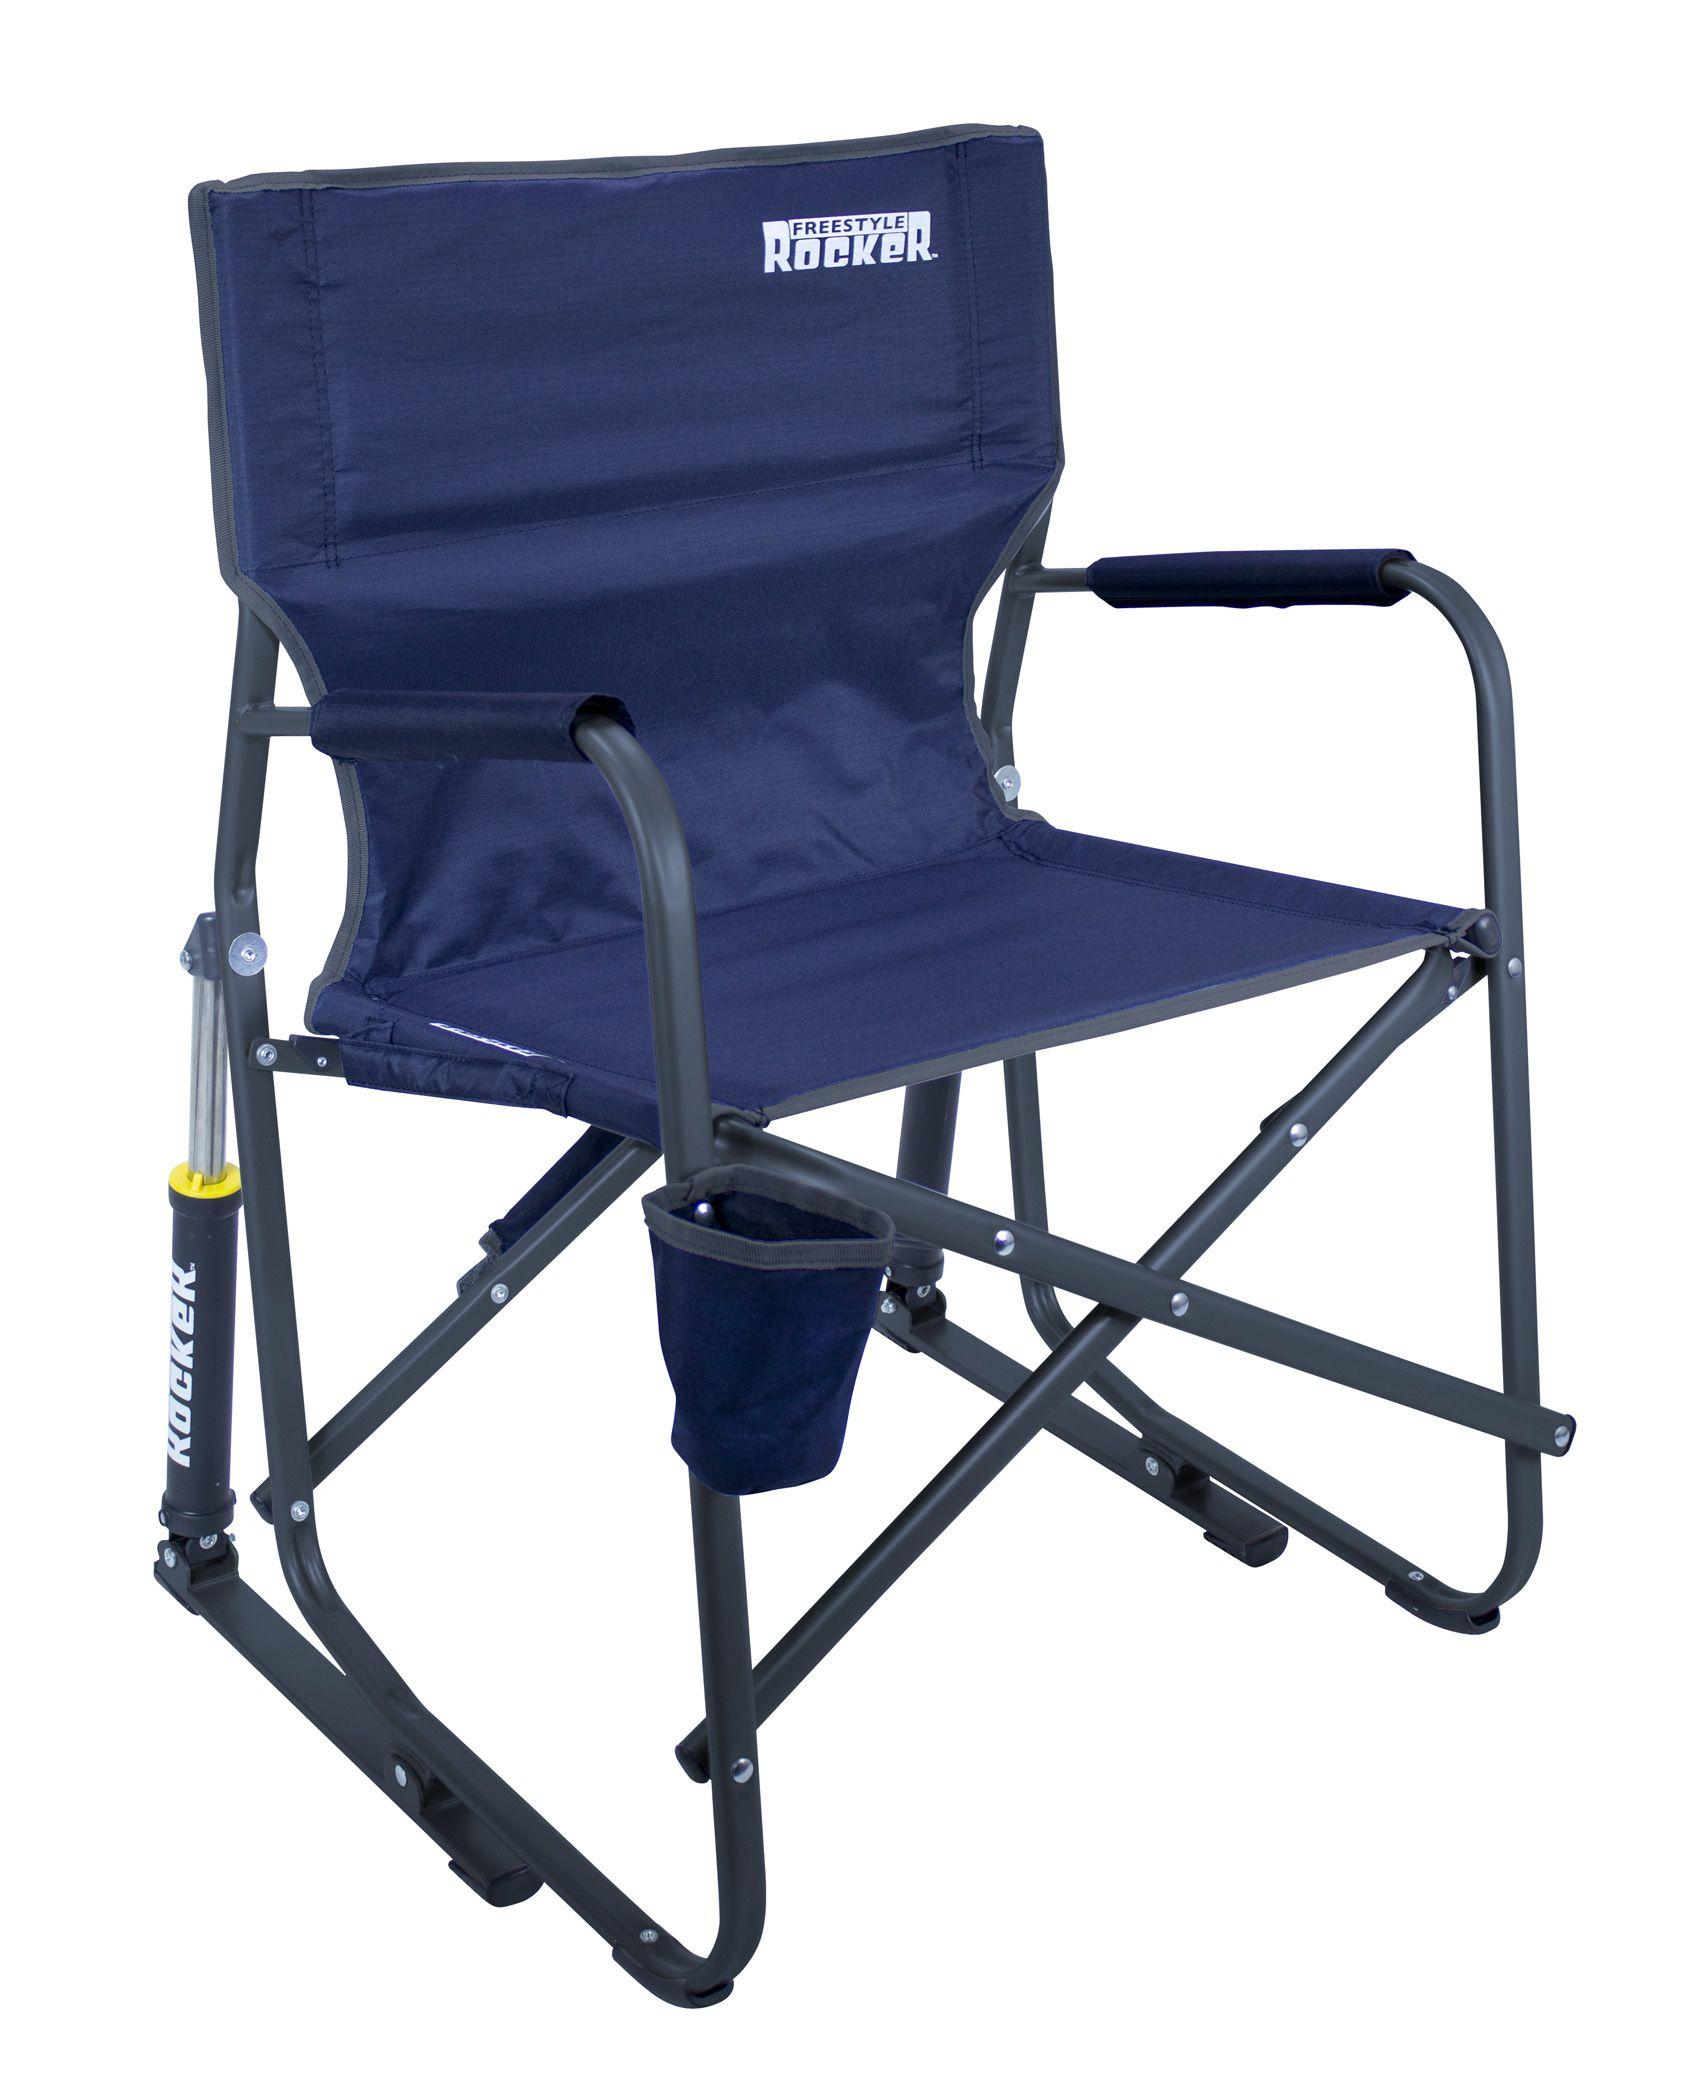 Freestyle Rocker™ Camping rocking chair, Rocker chairs